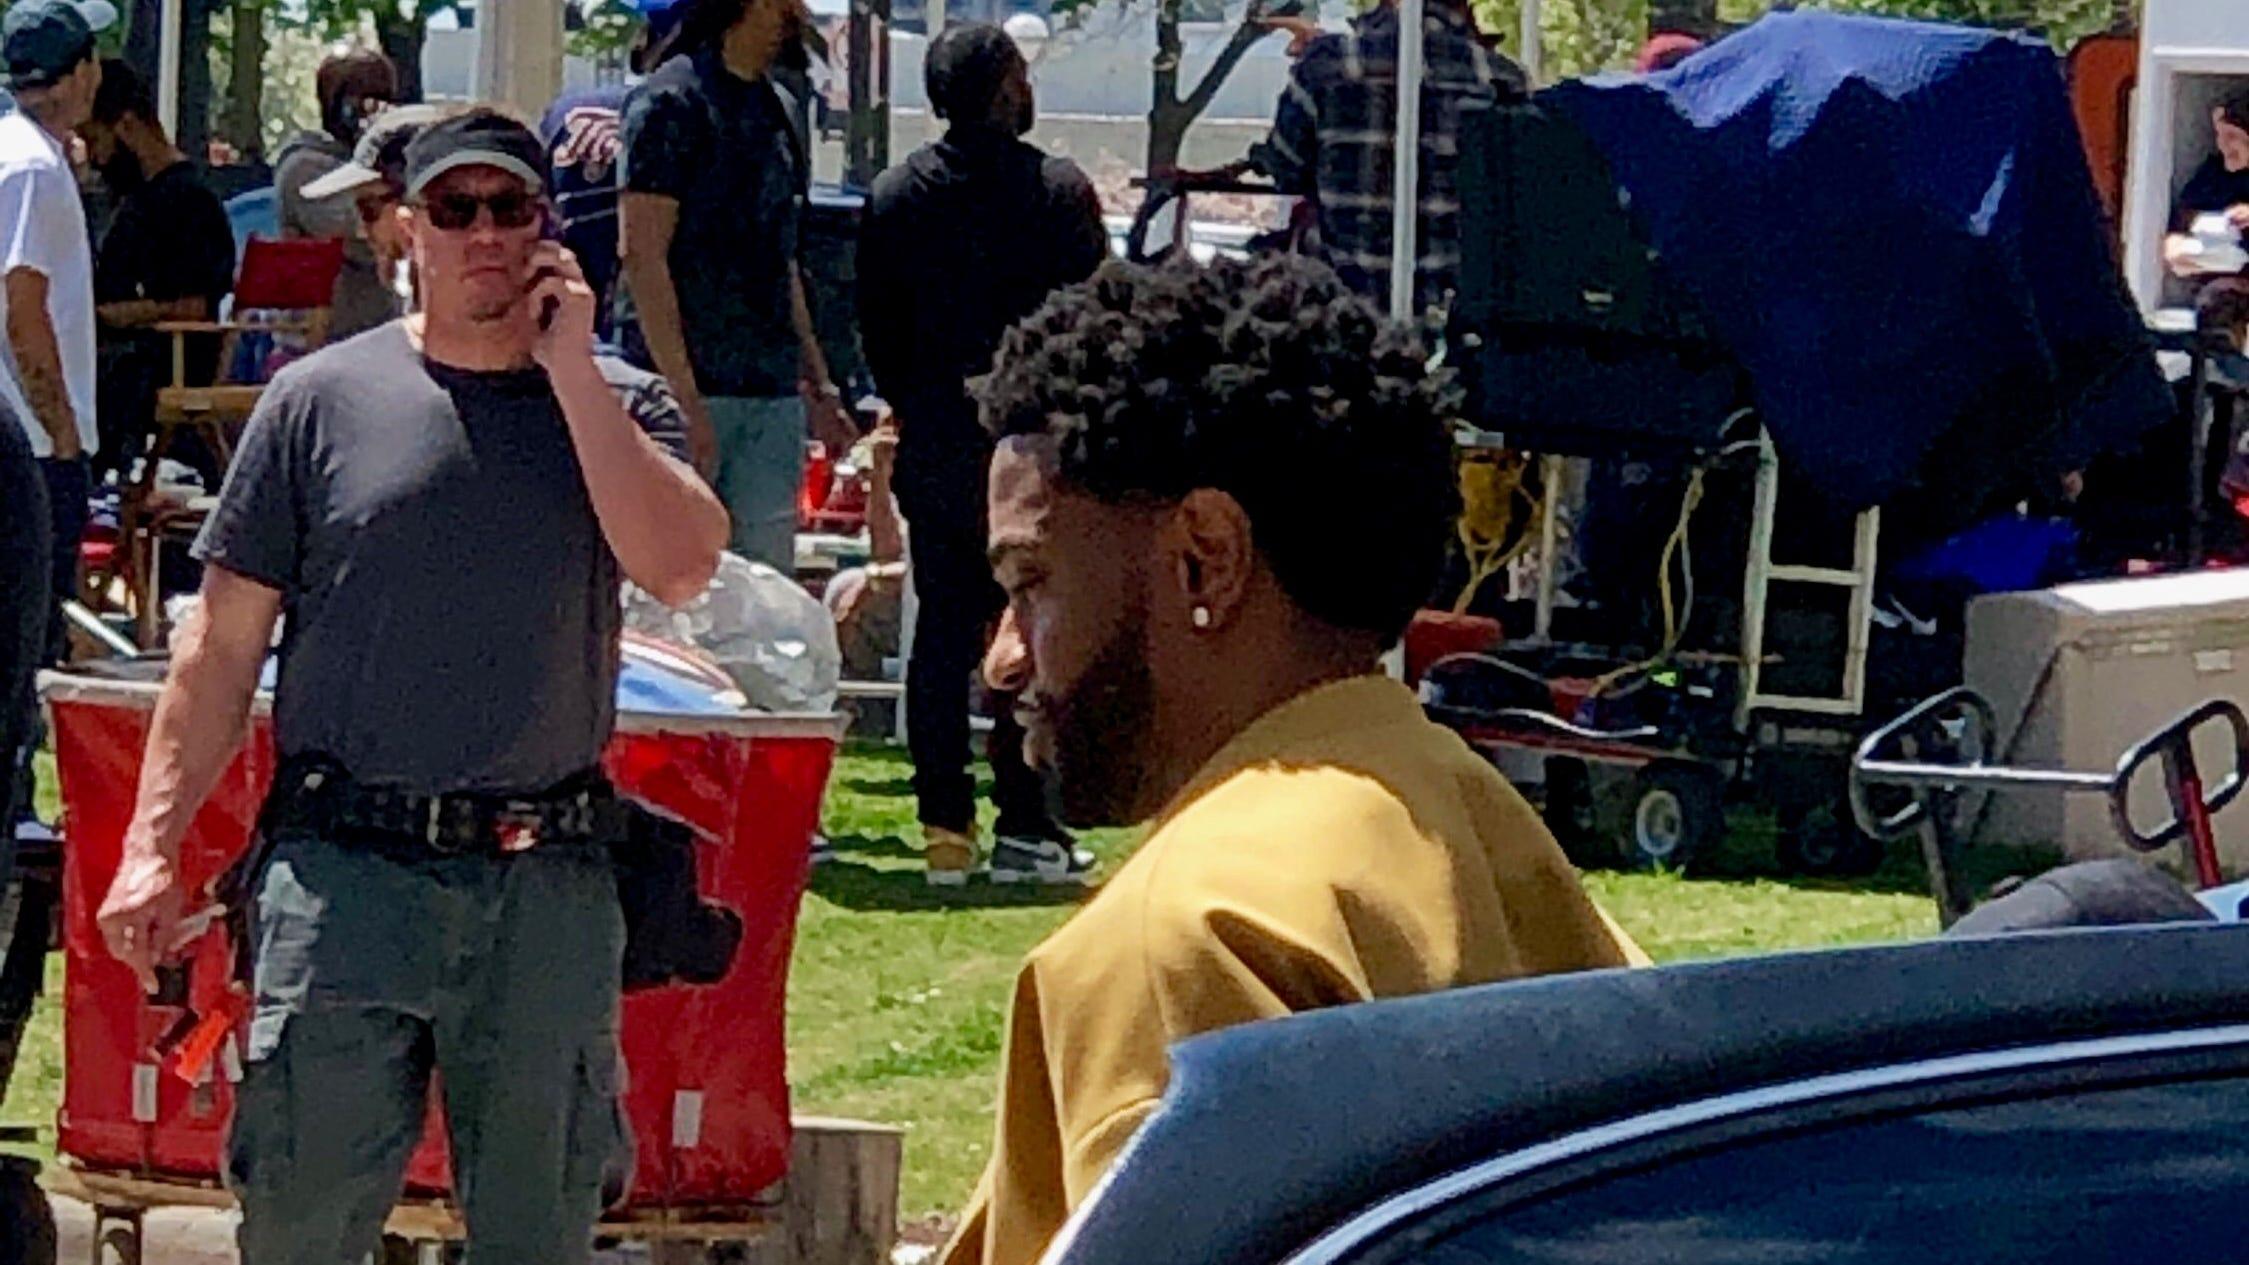 Detroiters watch as Big Sean shoots music video at Spirit Plaza